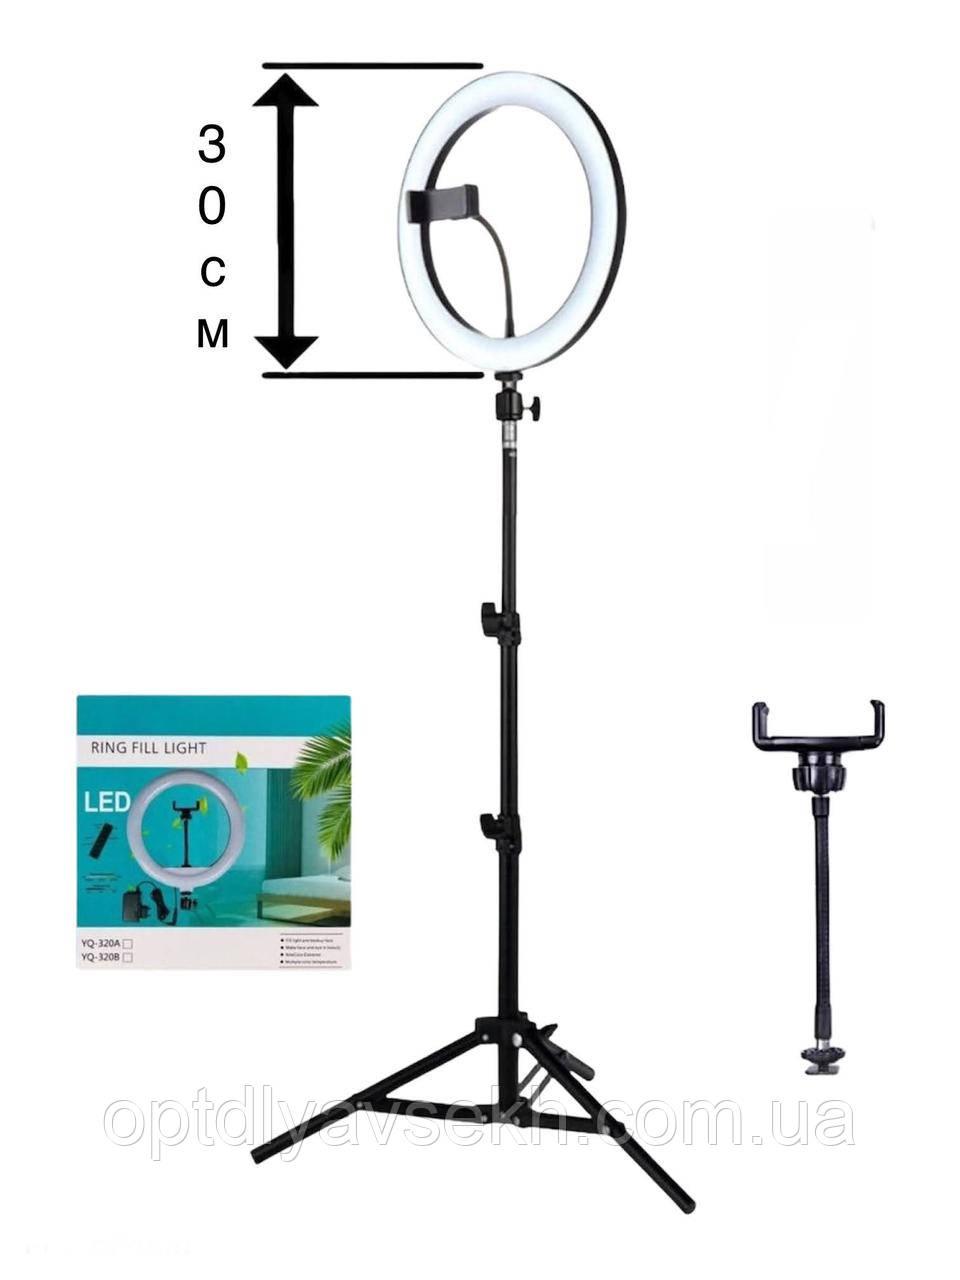 Кільцеподібна лампа Ring Fill Light, 20 Вт. 30 см